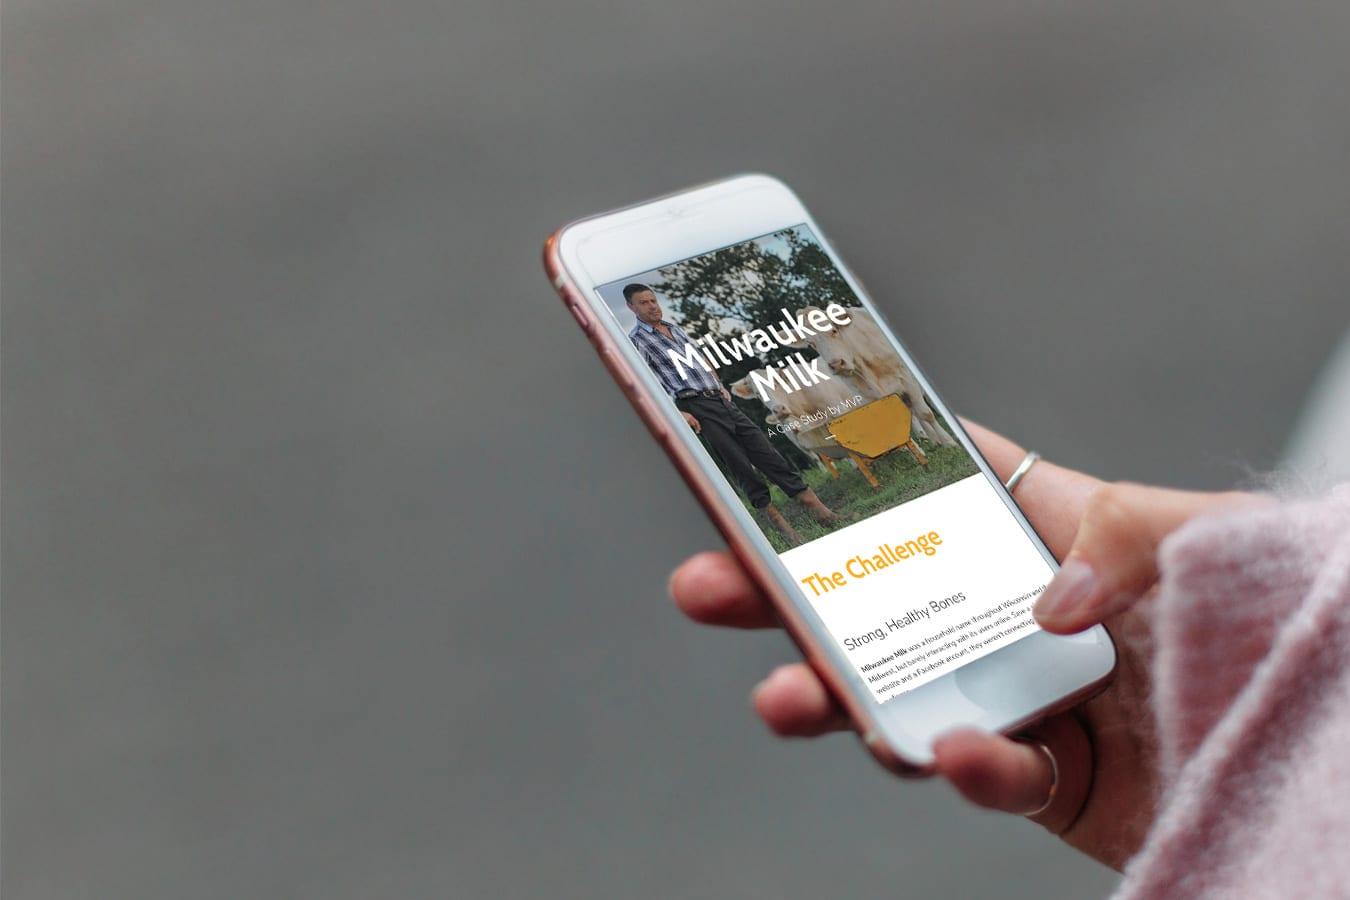 mobile-web-development-agency-case-study